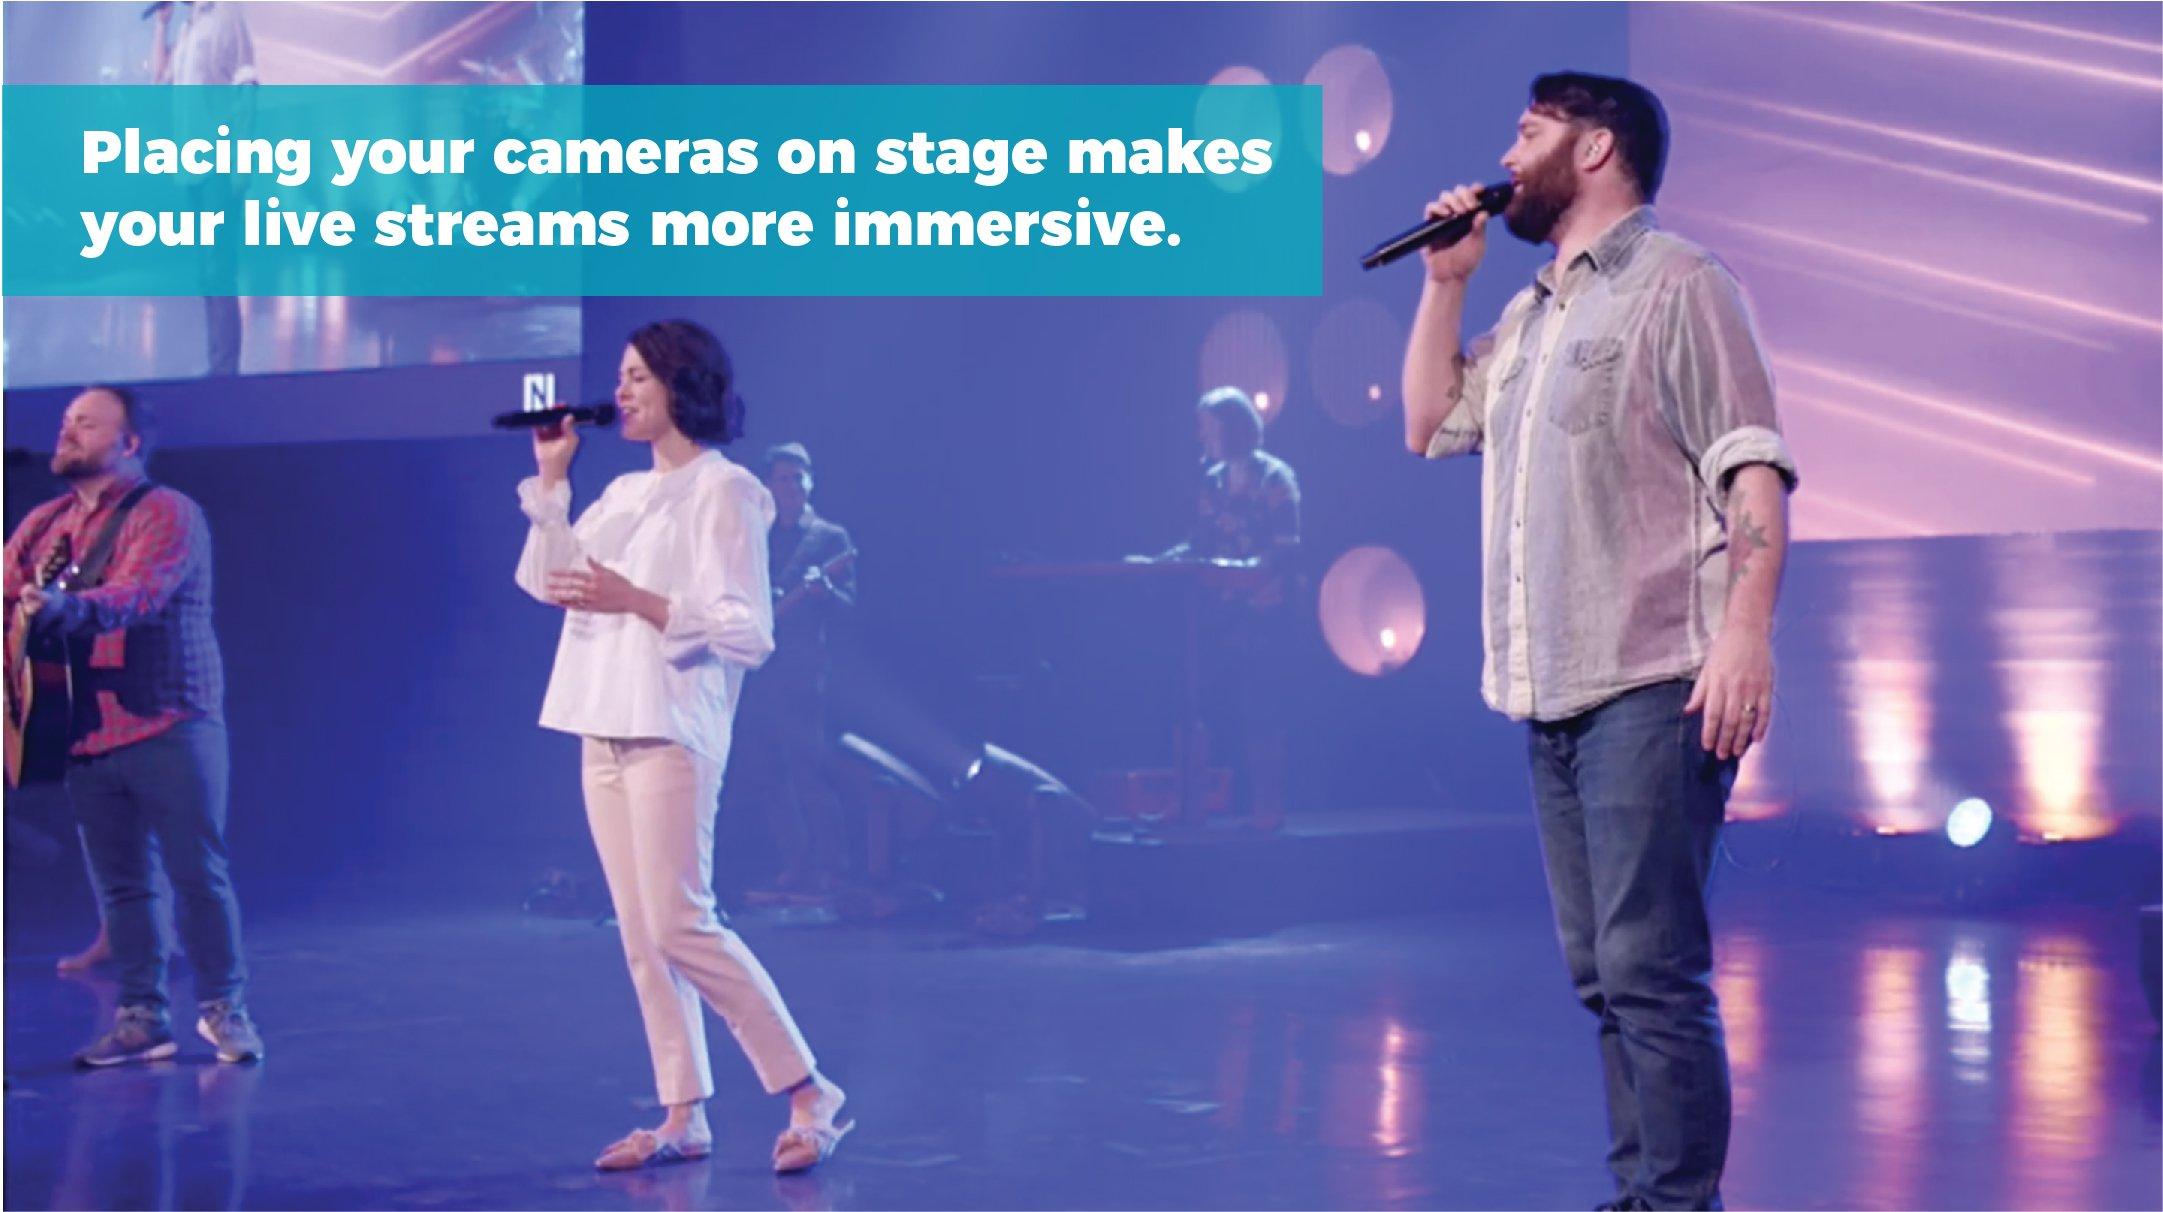 Live Sream Camera Angles@2x-100